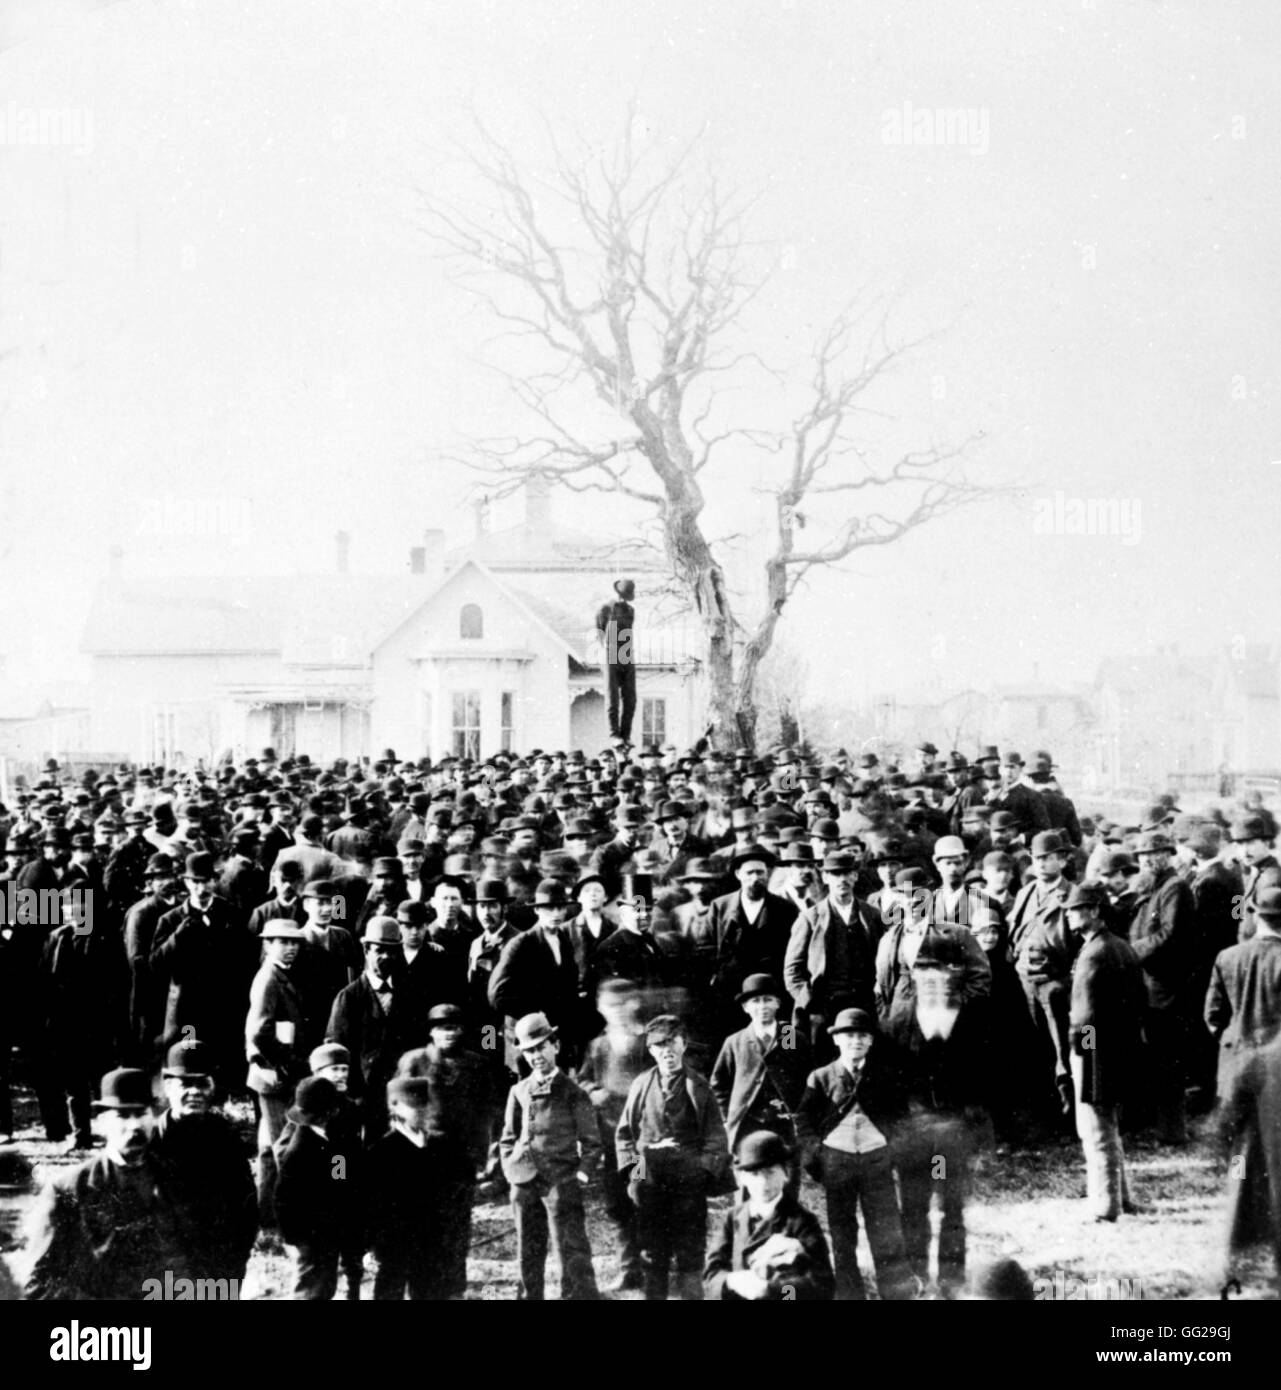 Lynching of a black man 1882 United States Washington. Library of Congress - Stock Image